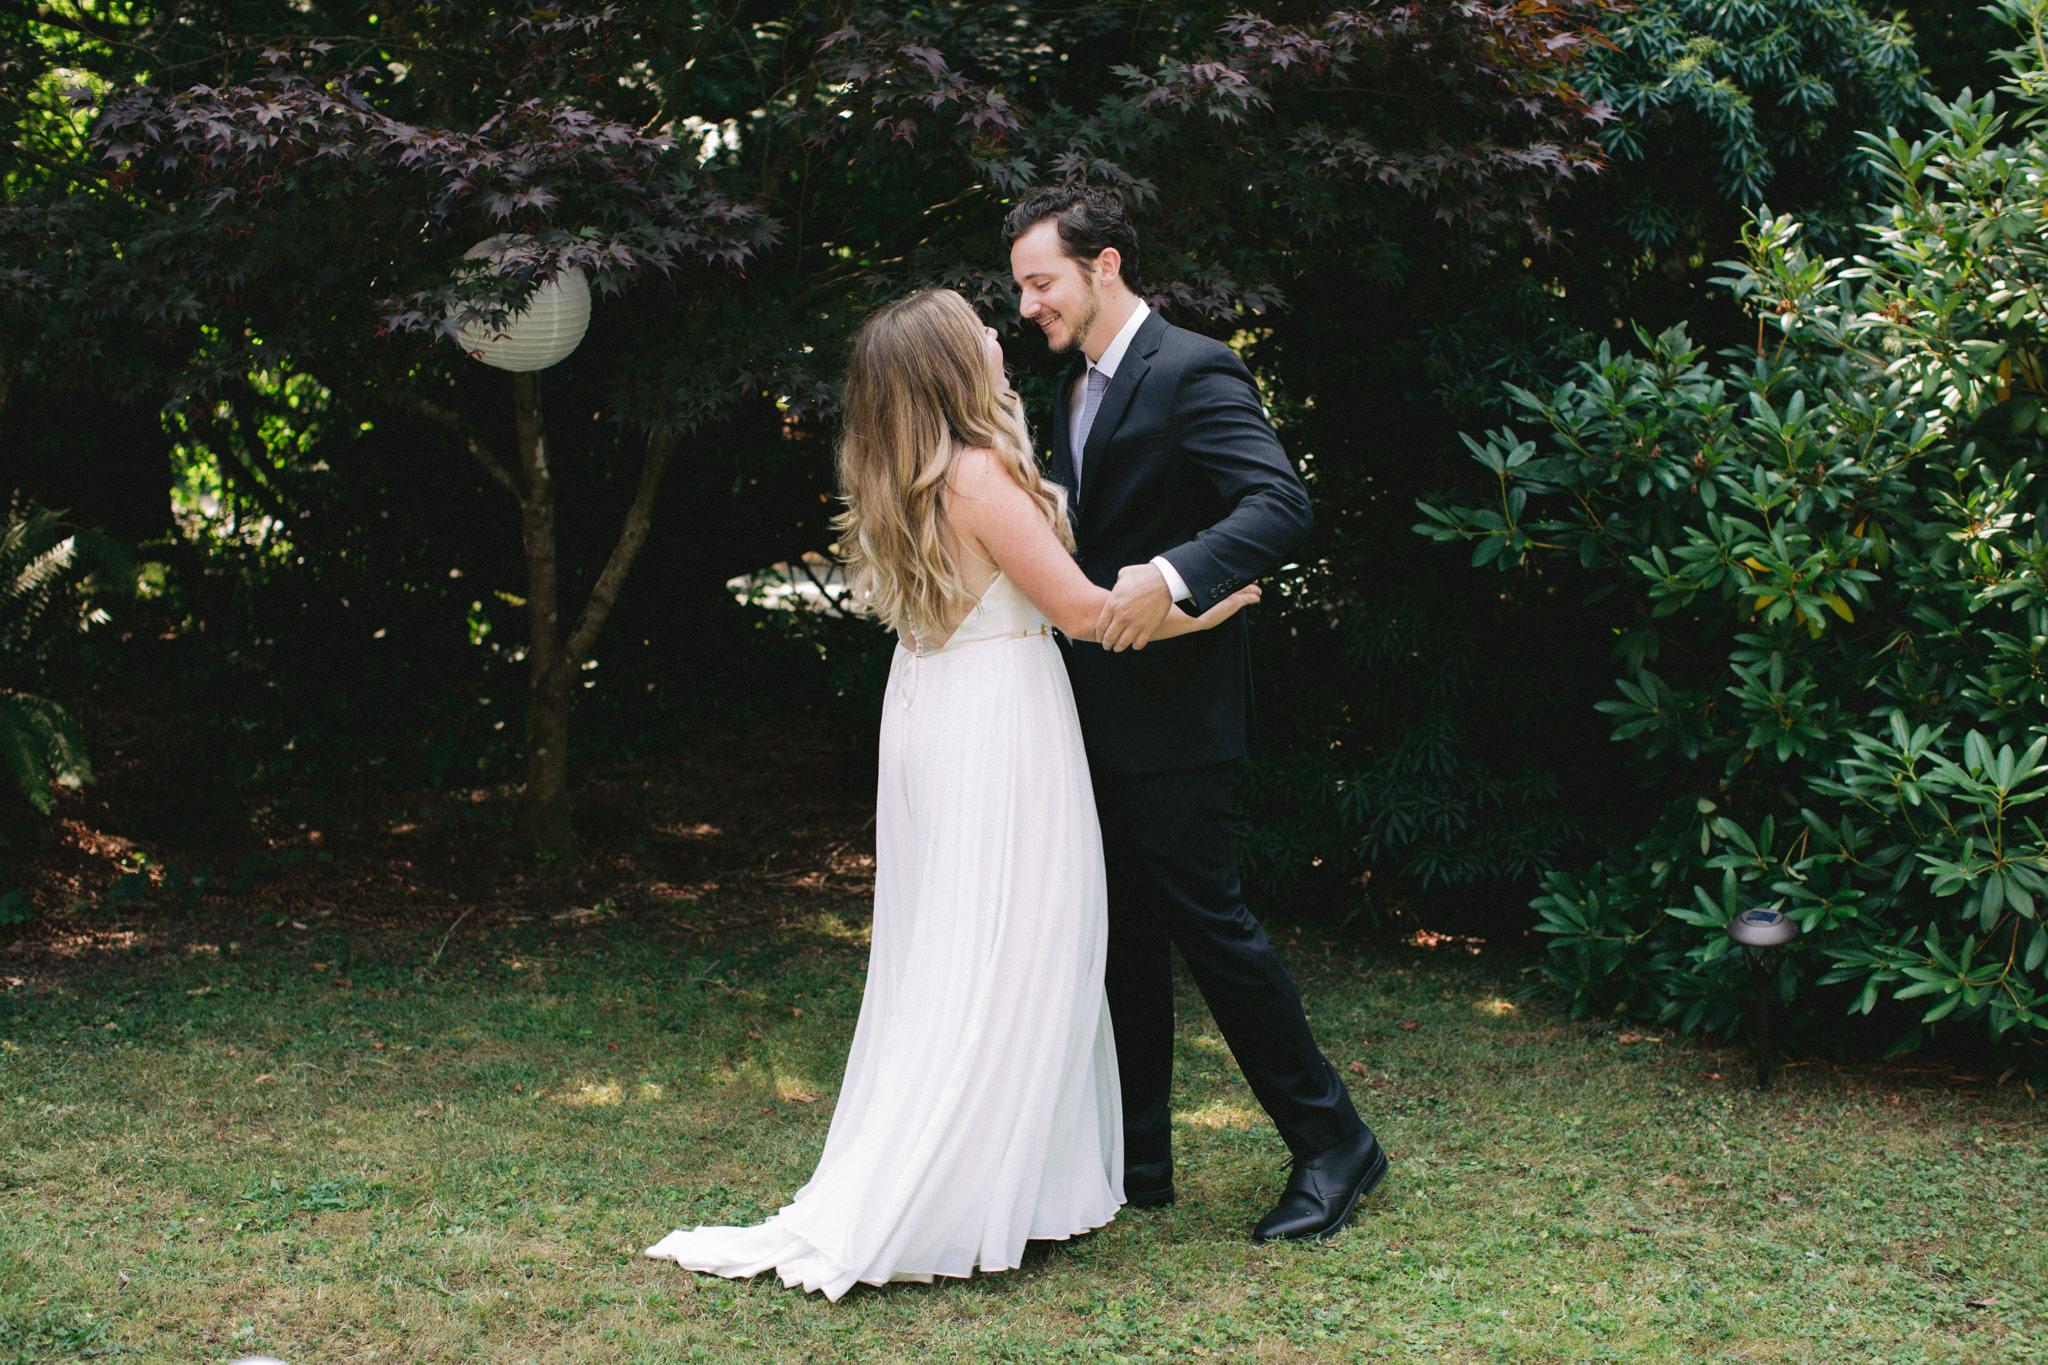 Backyard-Bainbridge-Island-Wedding-Alycia-Lovell-Photography-28.JPG